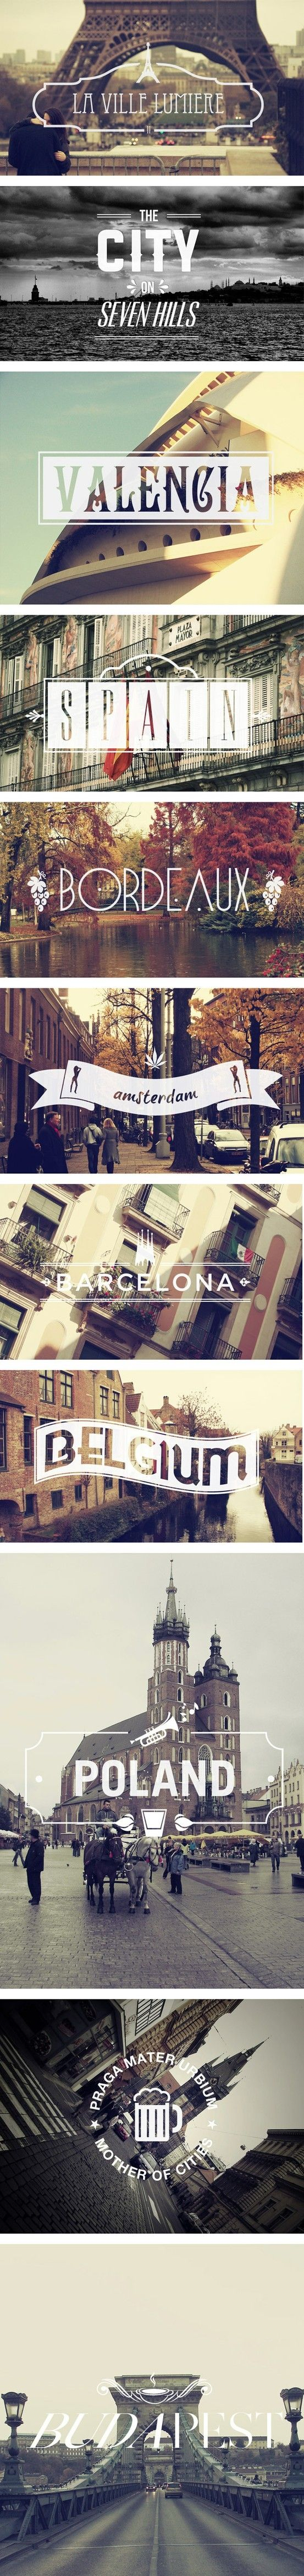 Let's go <3 #Travel #Europe